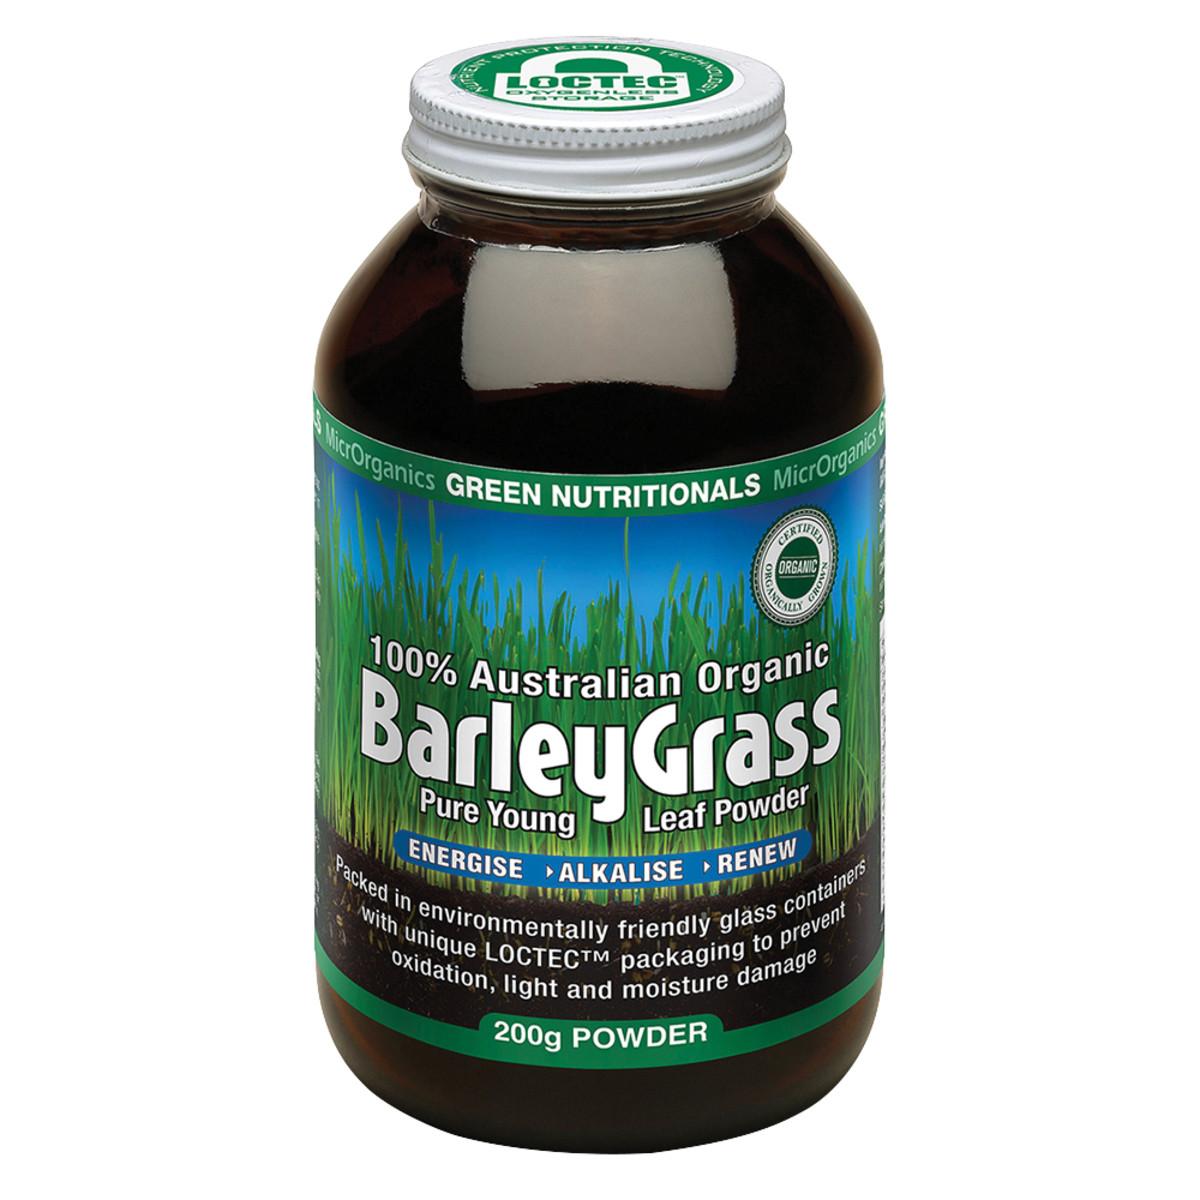 MICRORGANICS GREEN NUTRITIONALS BARLEY GRASS 200G BONUS 25